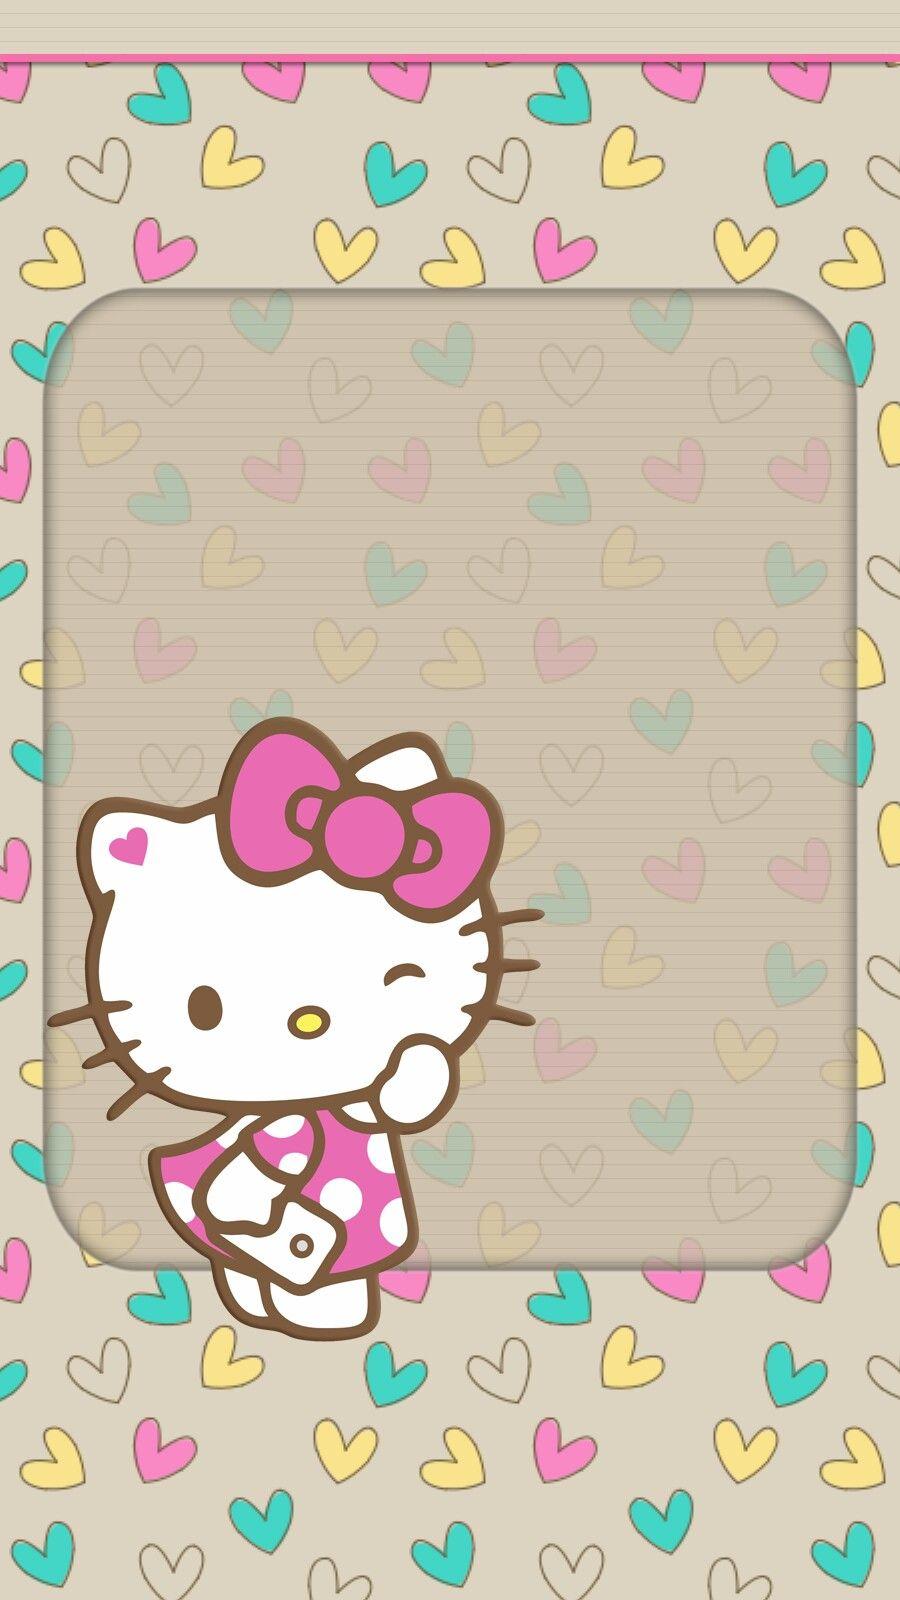 Great Wallpaper Hello Kitty Iphone 6 - 188a55cdb19e62cc506a3bf92ab0a8dc  Trends_852915.jpg